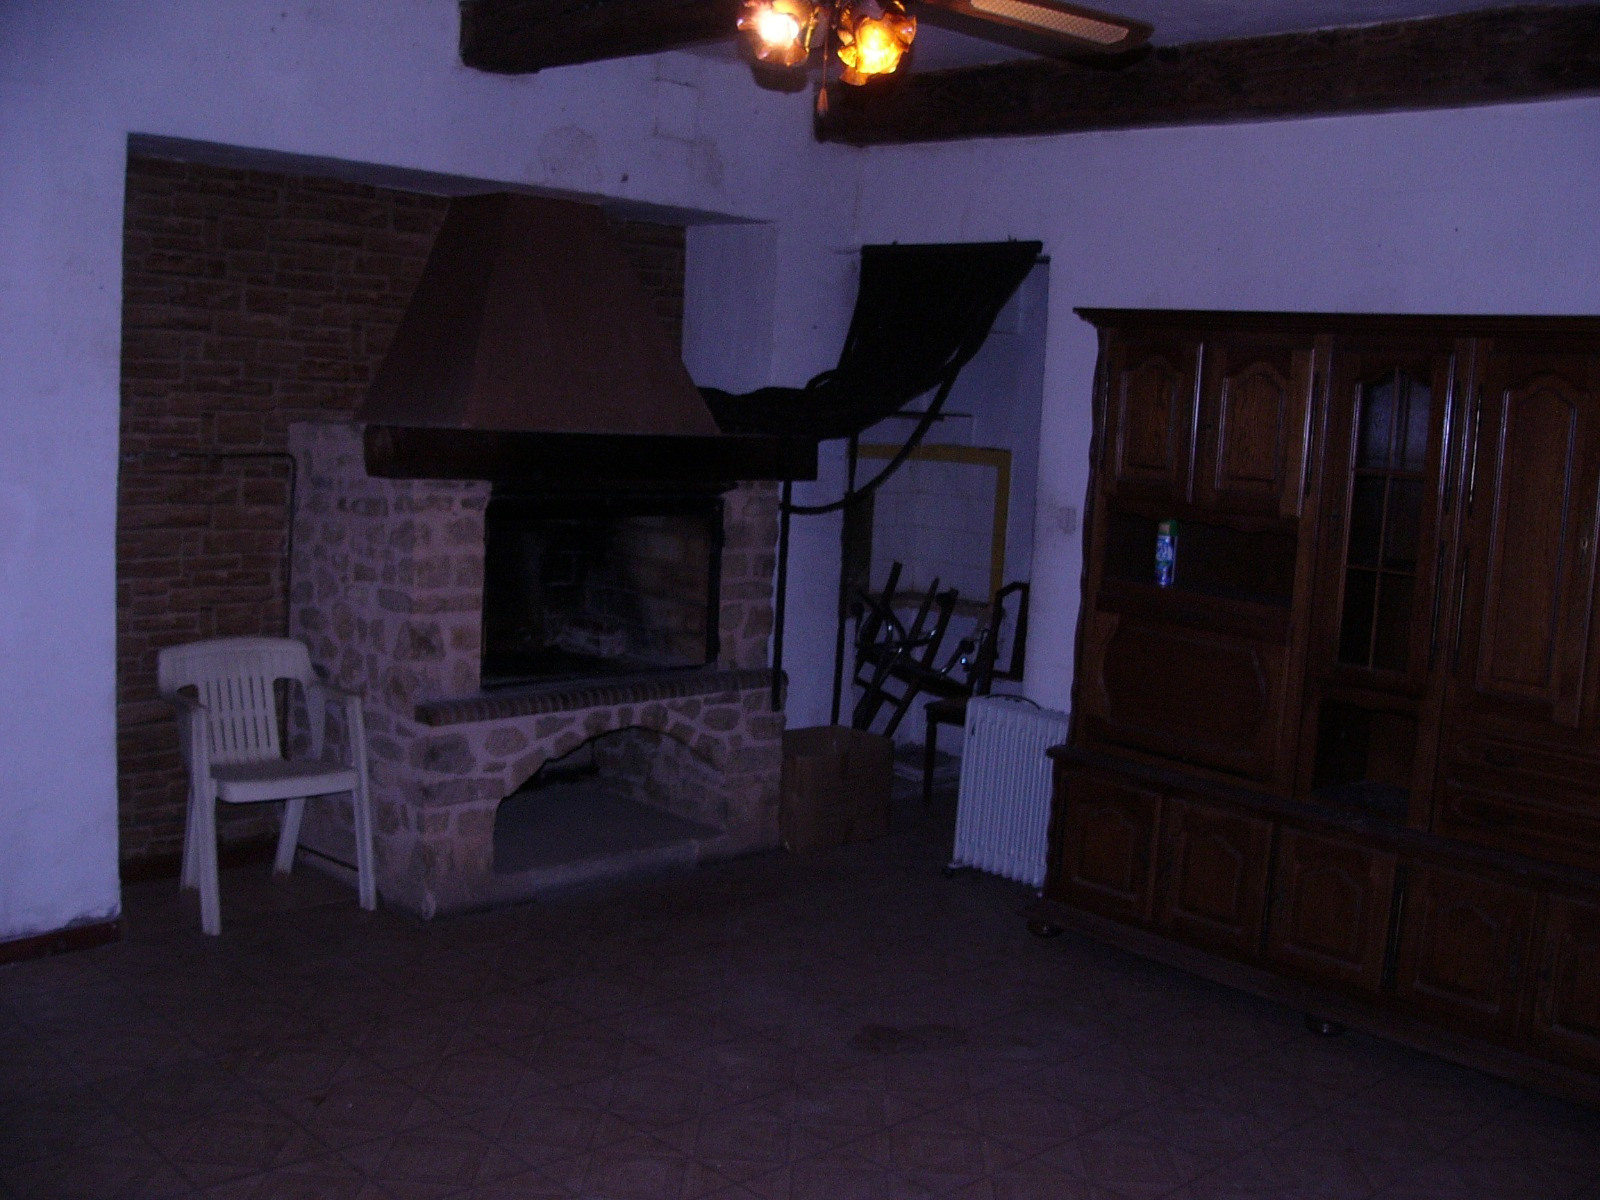 Vente maison/villa 5 pièces mornas 84550